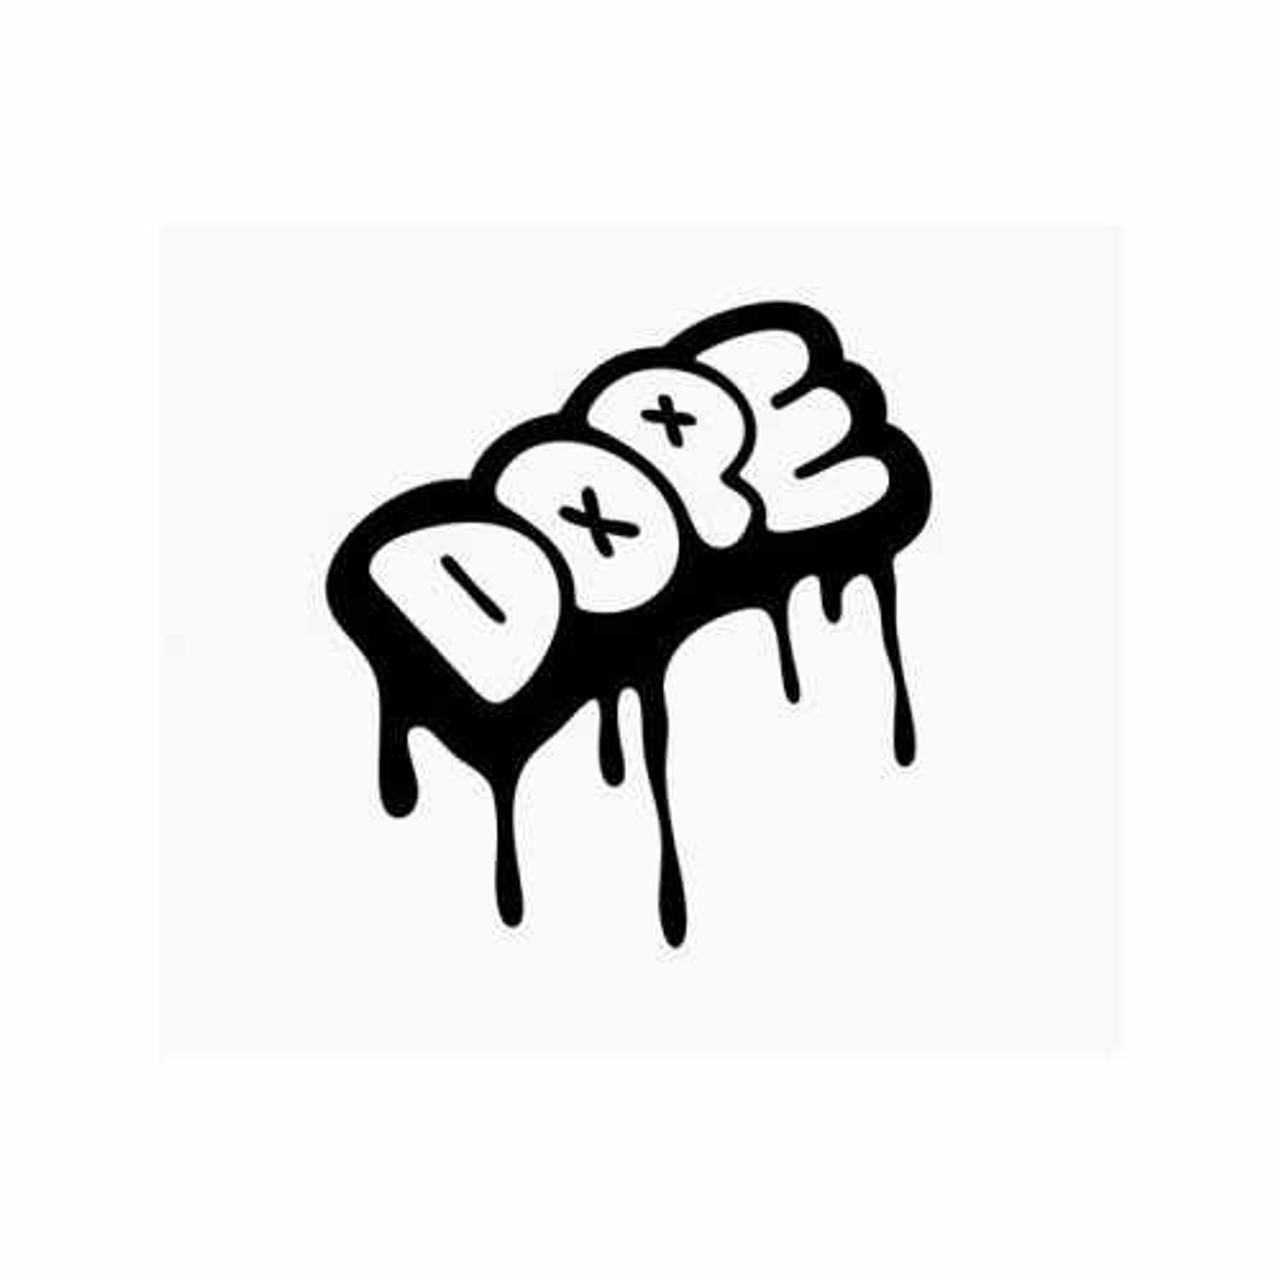 Dope graffiti drip vinyl decal sticker